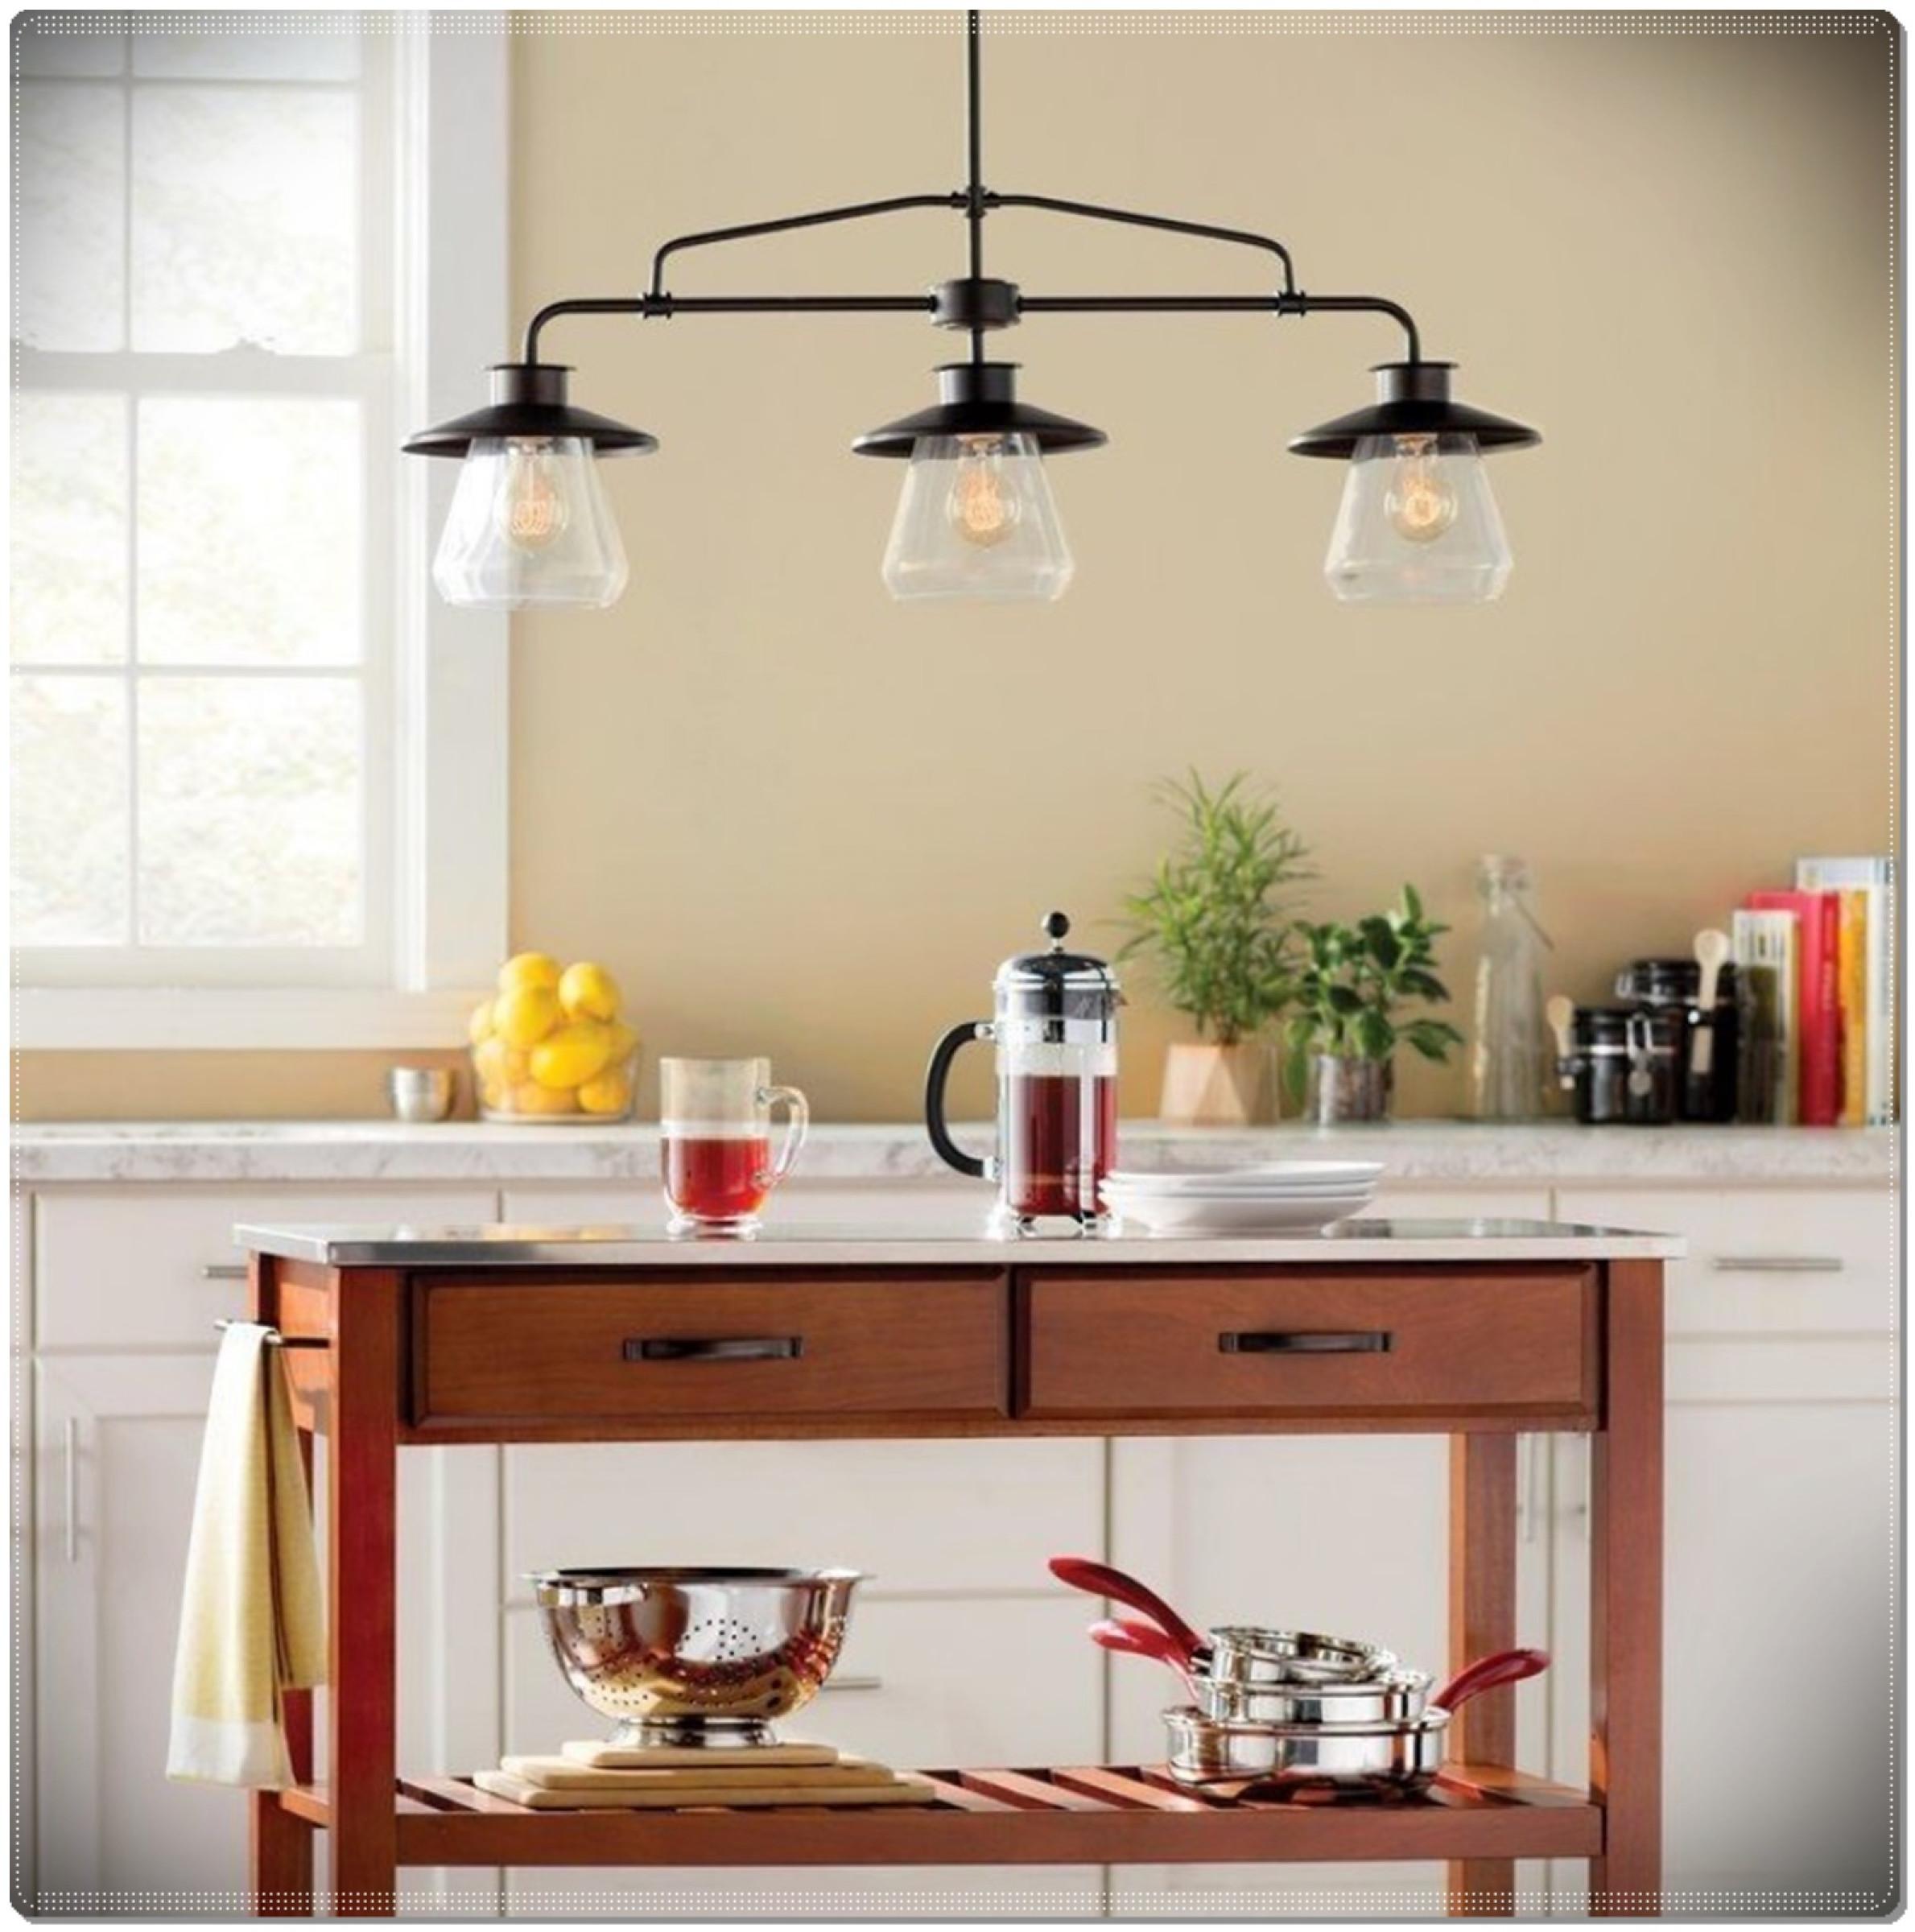 Vintage kitchen 3 light island lamp pendant lighting dining room vintage kitchen 3 light island lamp pendant lighting dzzzfo